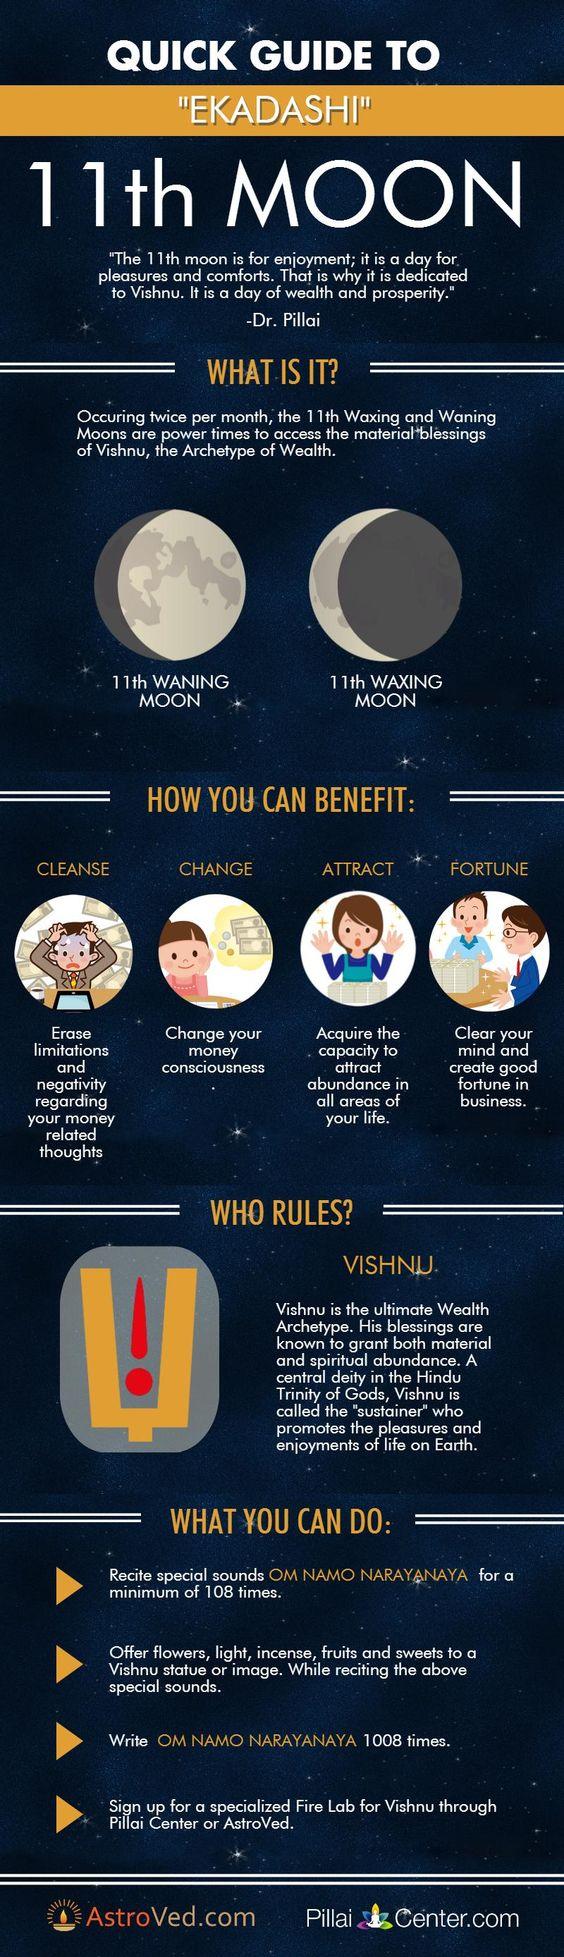 11th Moon - Vedic Astrology: